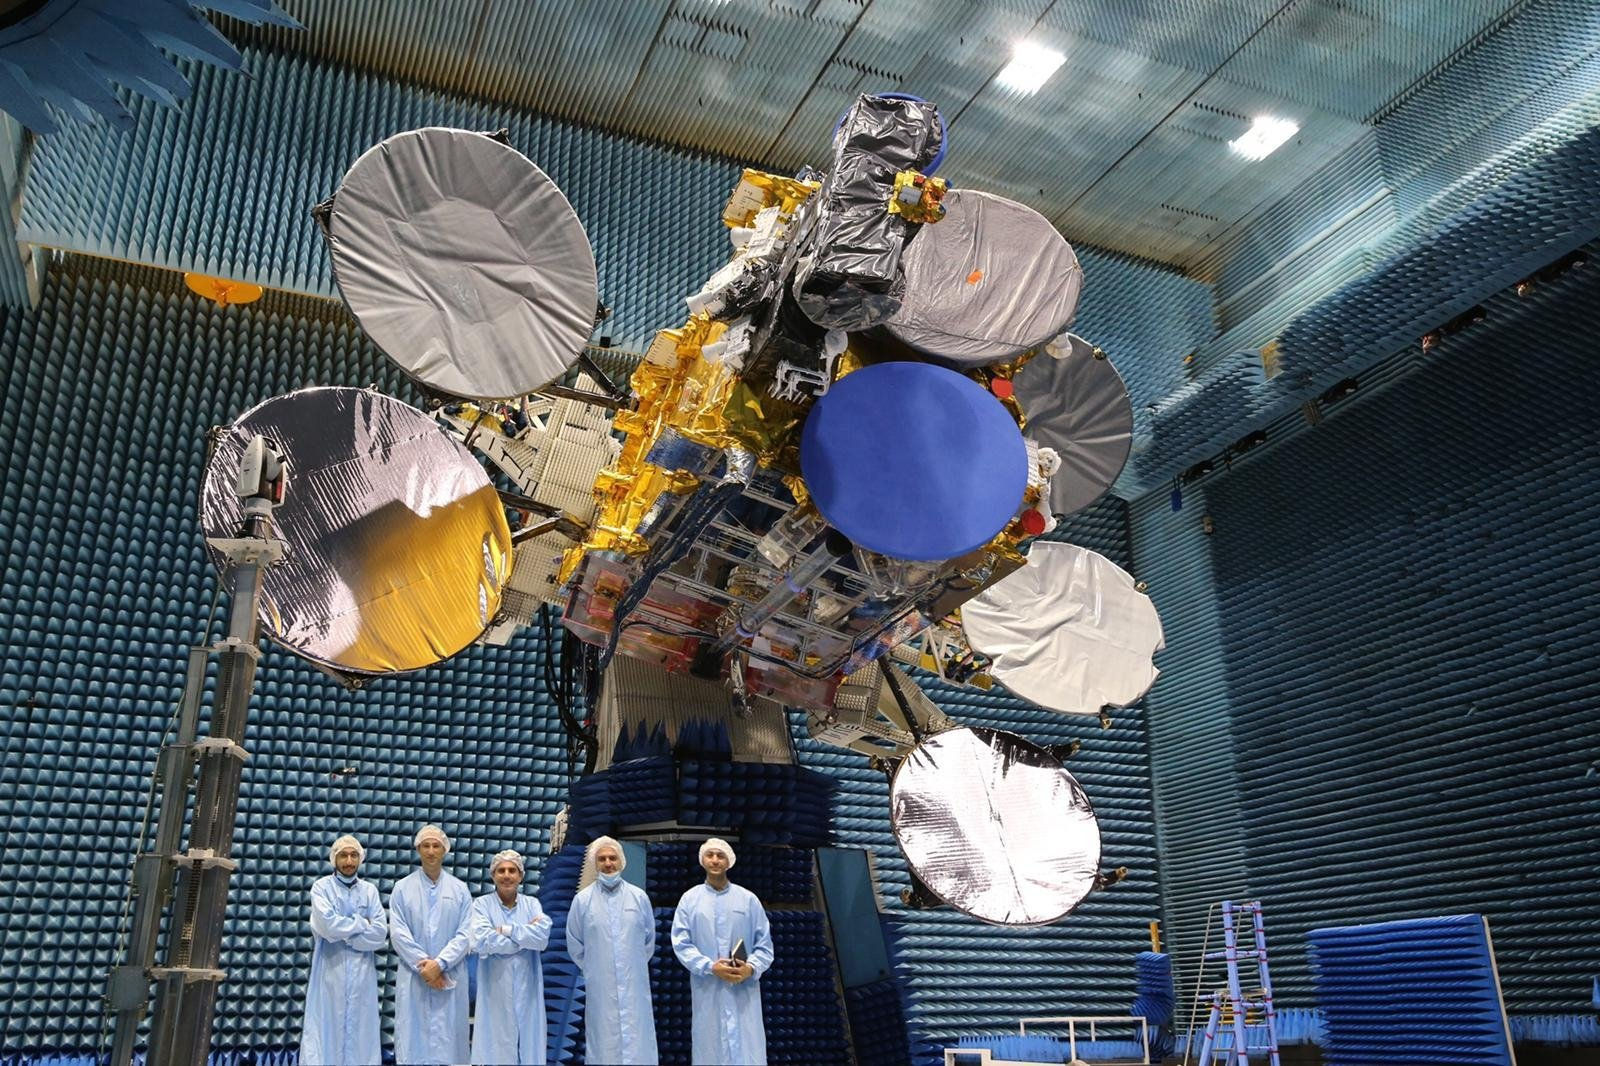 The new-generation communication satellite Türksat 5A at a facility in the capital Ankara, Turkey, Oct. 2, 2020. (AA Photo)